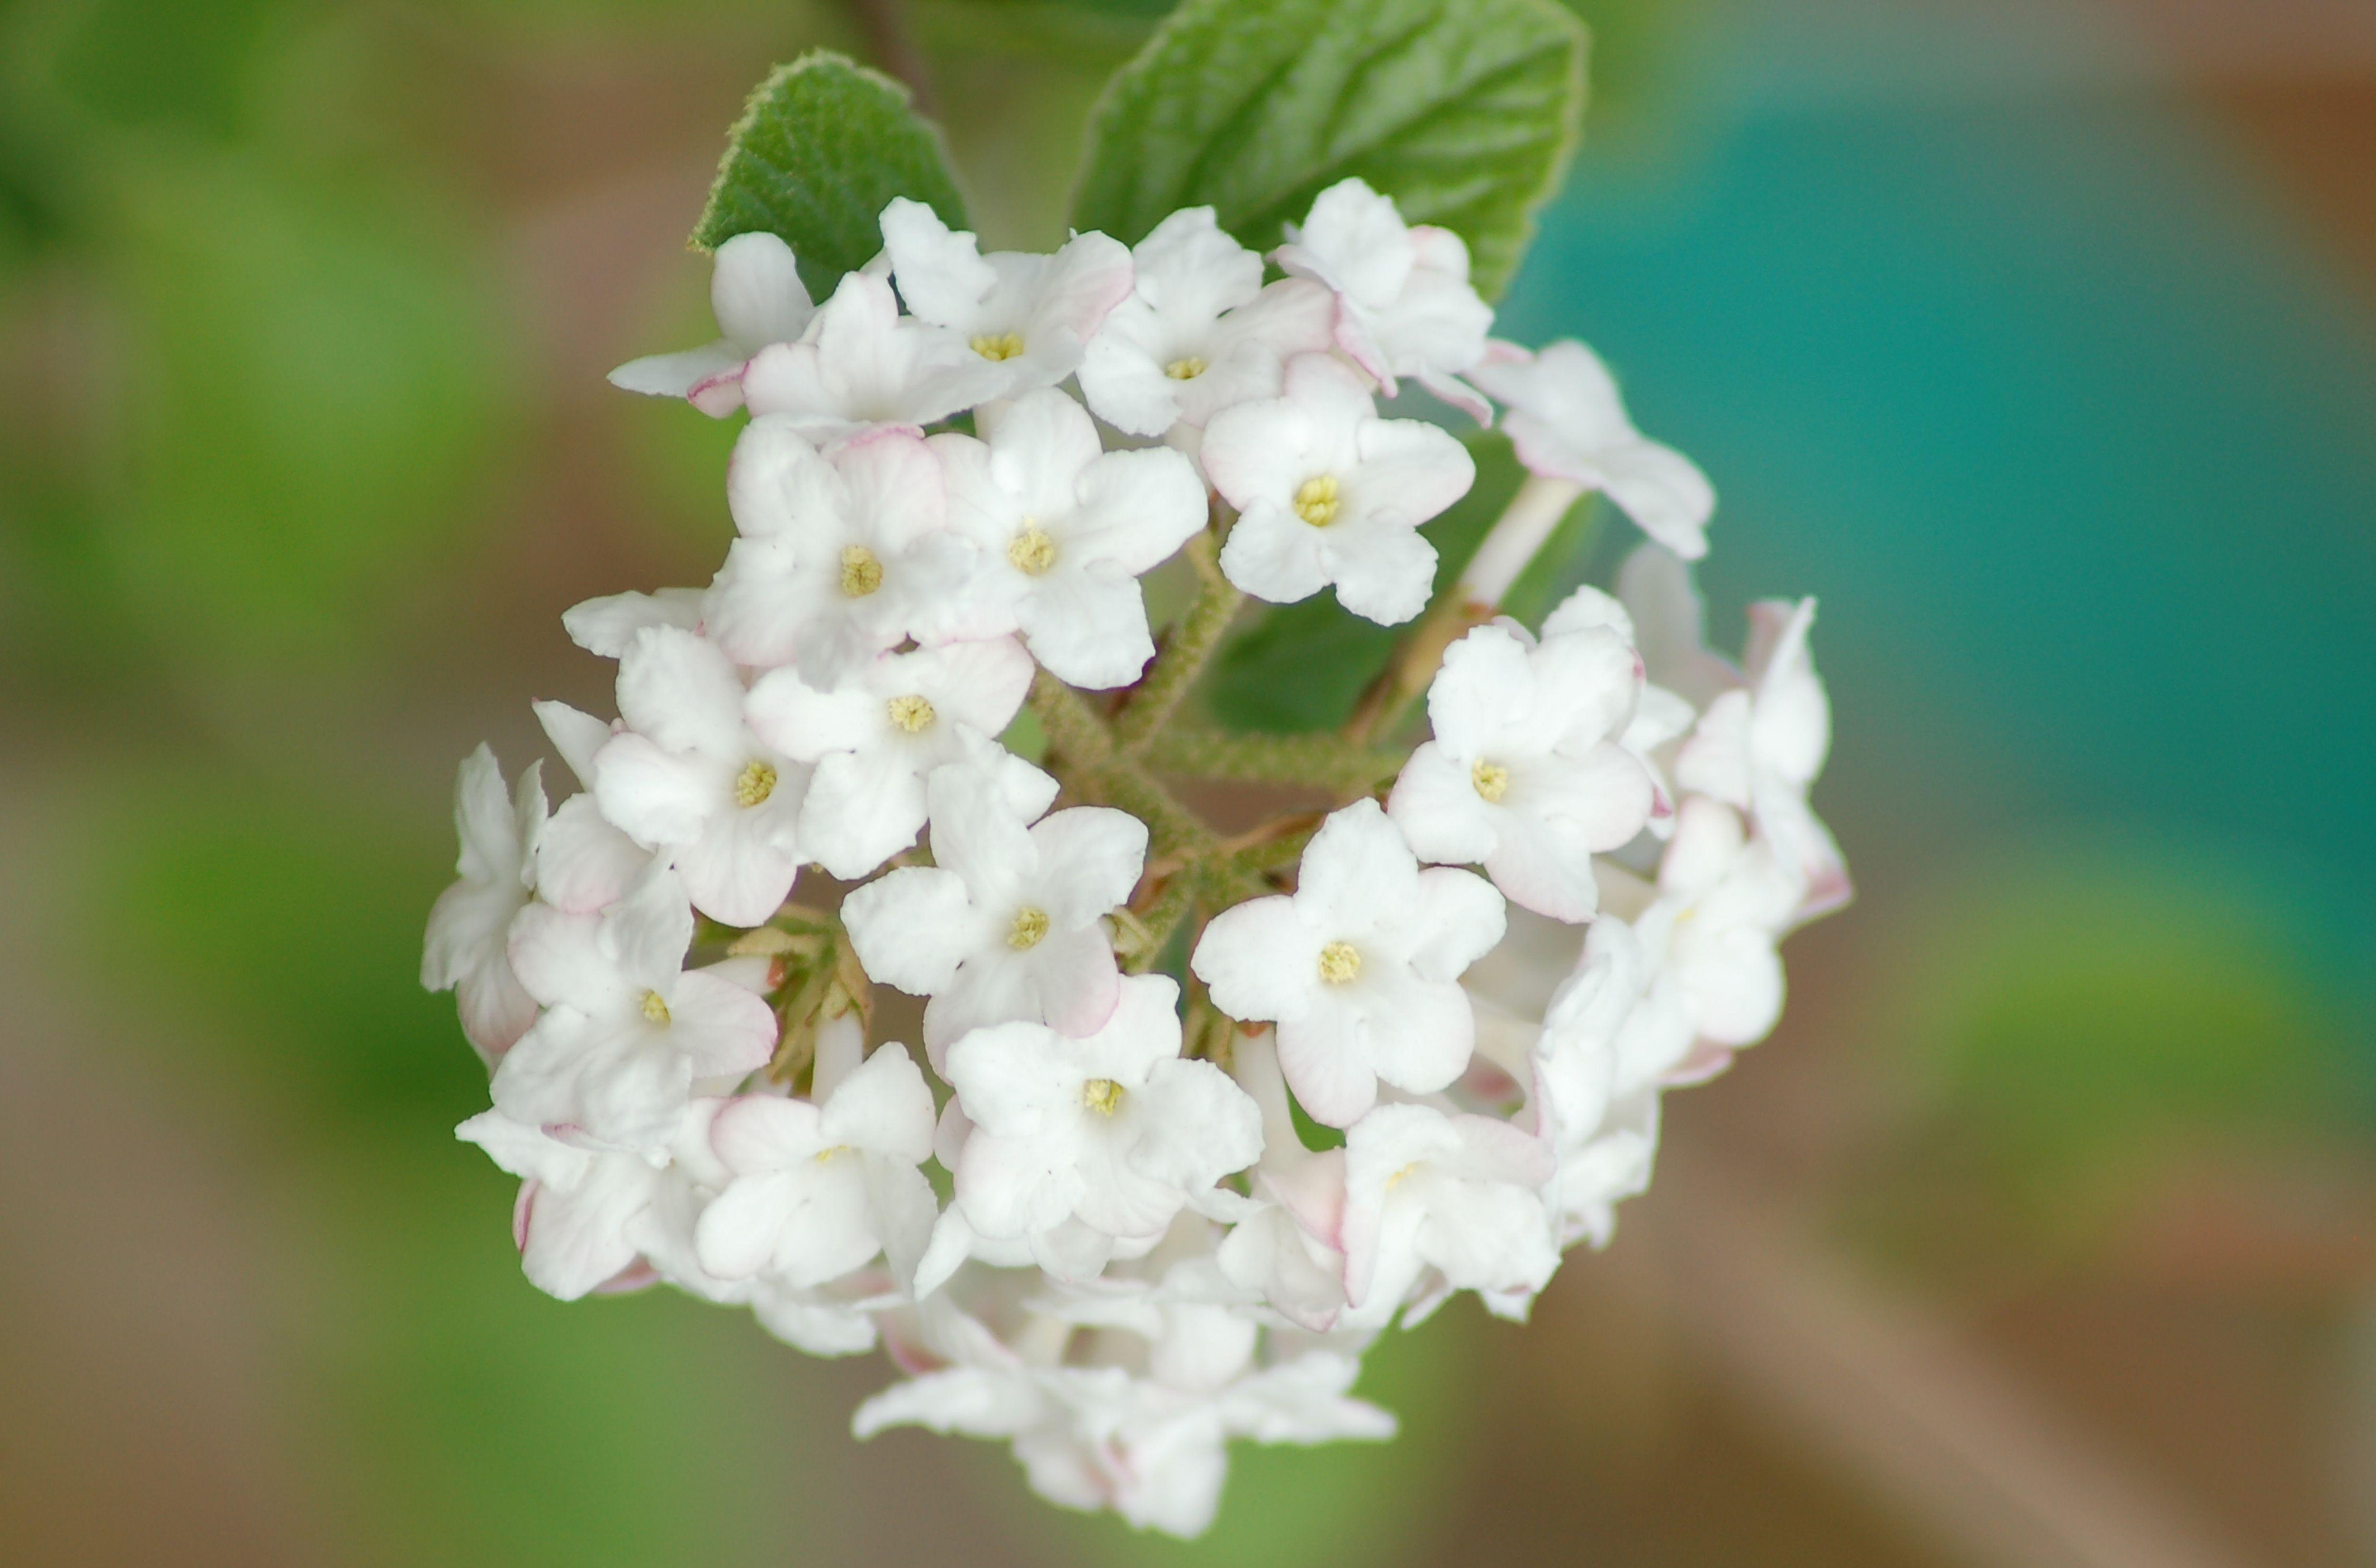 Korean Spice Viburnum Shrub The Fragrant Spicebush